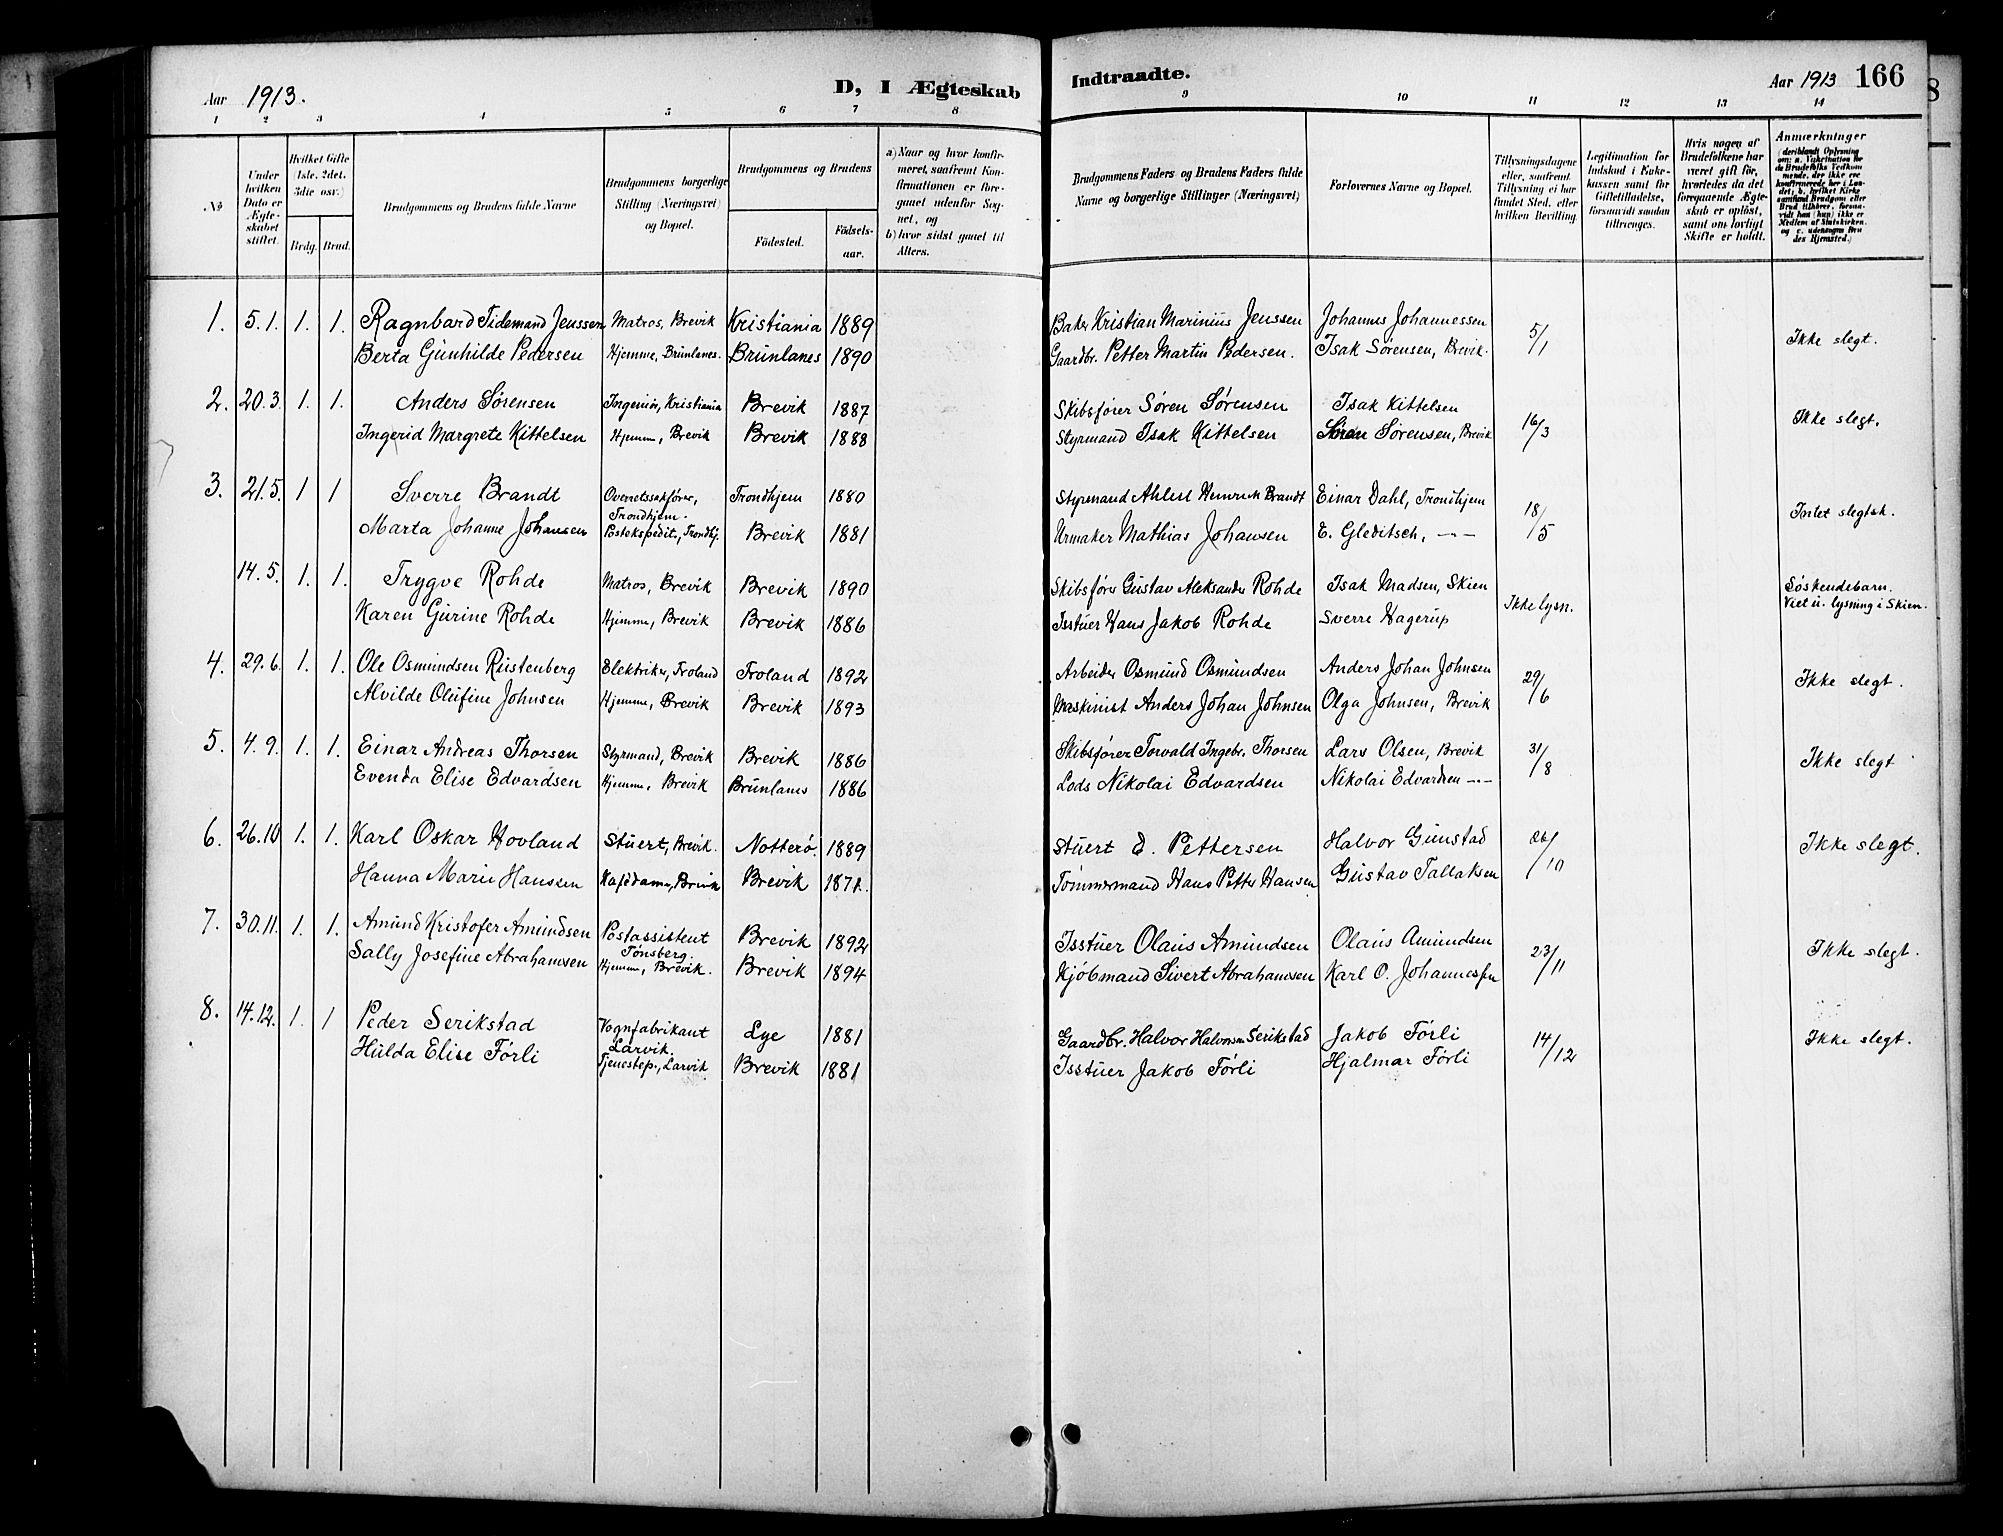 SAKO, Brevik kirkebøker, G/Ga/L0005: Klokkerbok nr. 5, 1901-1924, s. 166